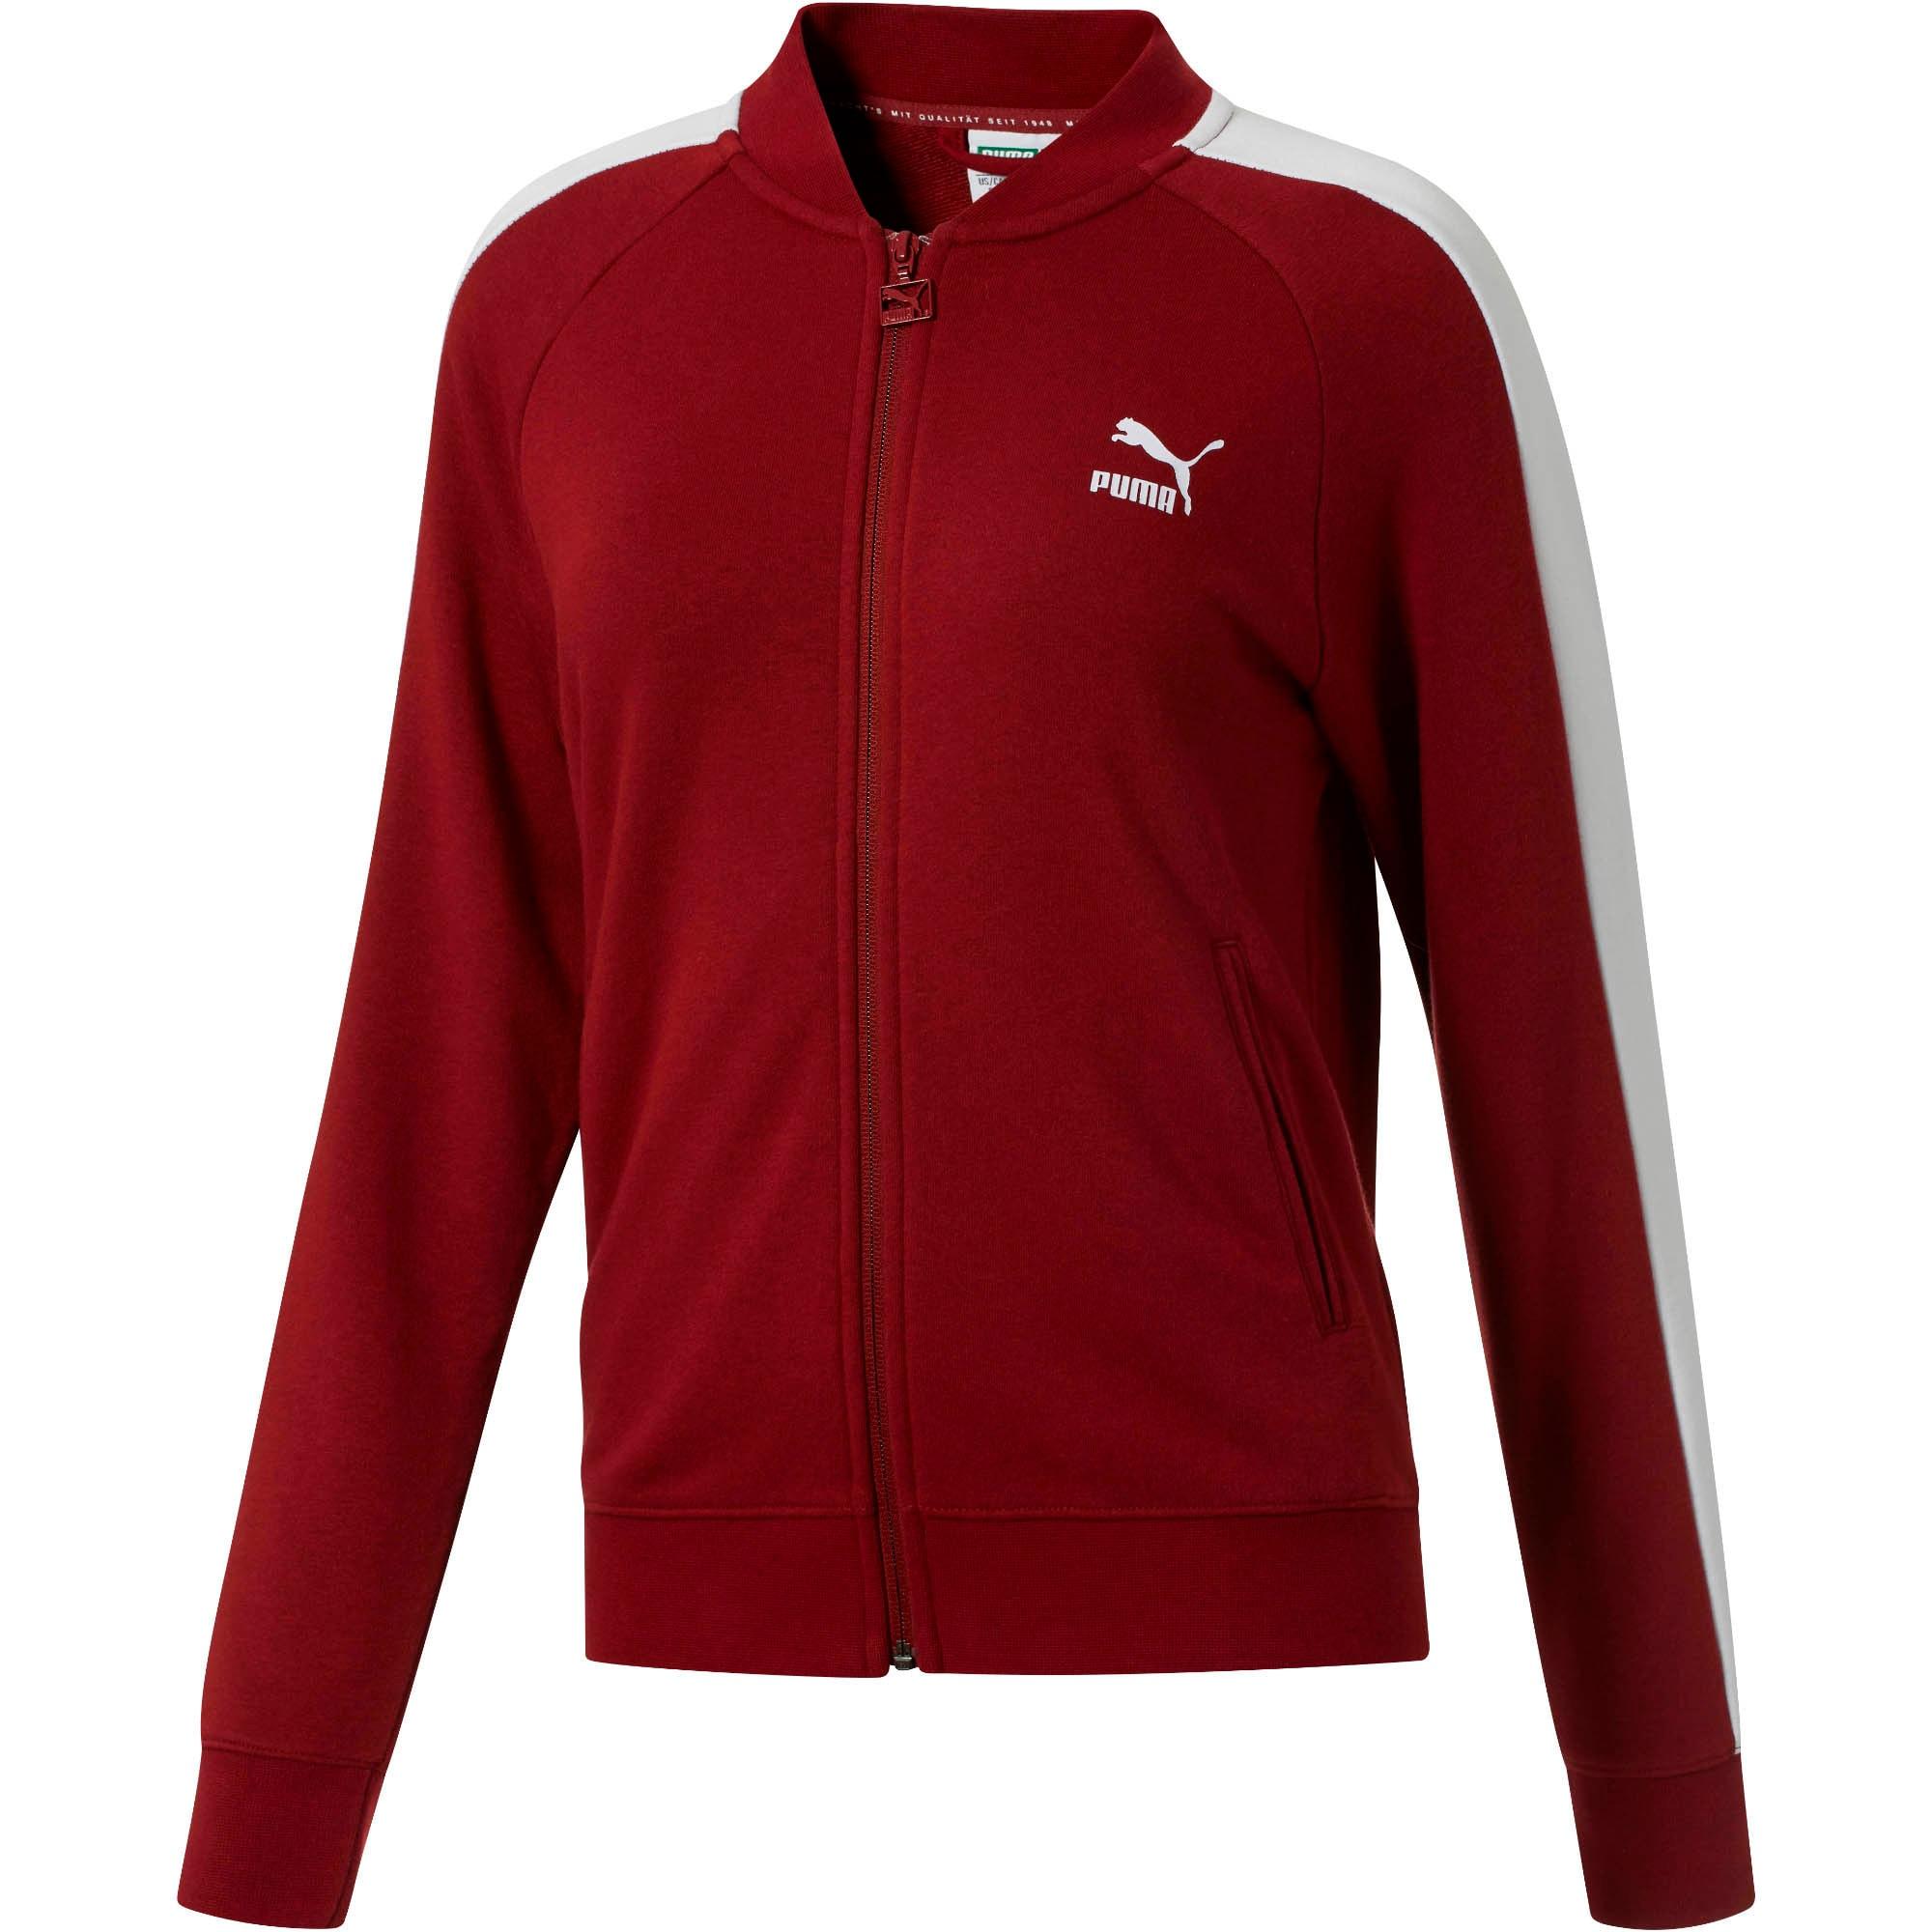 Thumbnail 1 of Classics T7 Women's Track Jacket, Pomegranate, medium